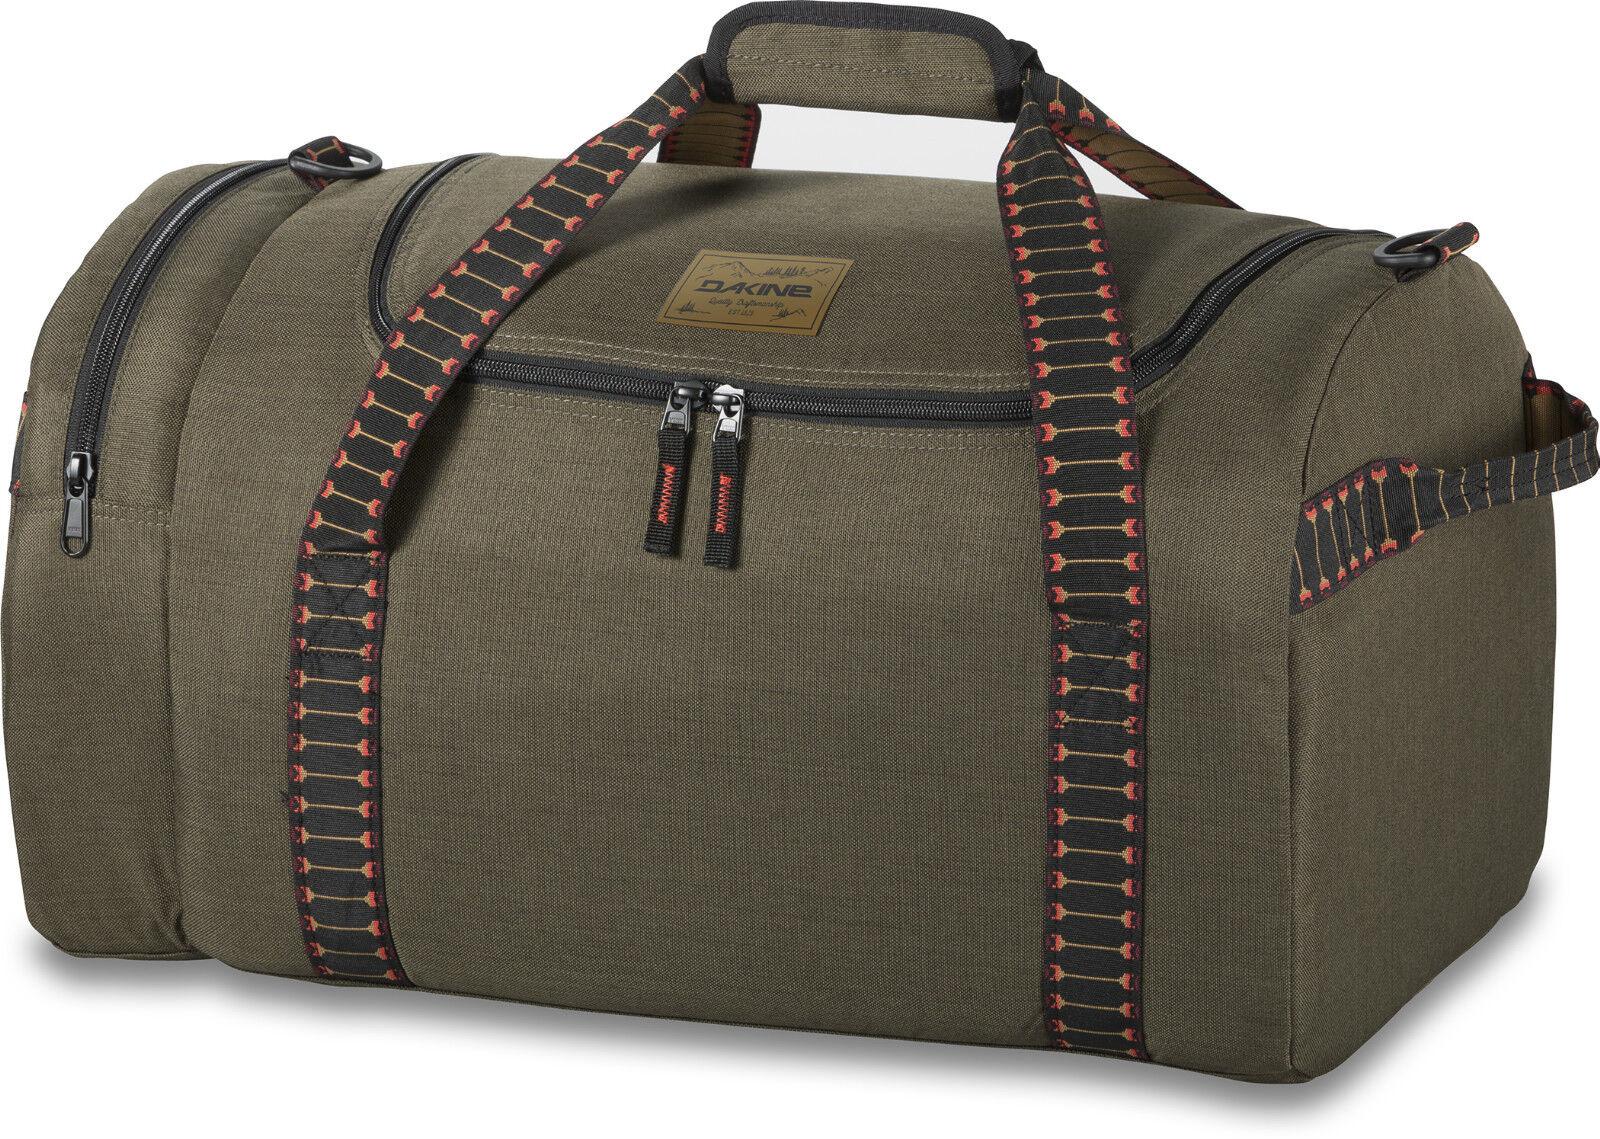 Dakine eq Bag small bolsa de gimnasia-bolsa de viaje 31 l-a distancia-nuevo